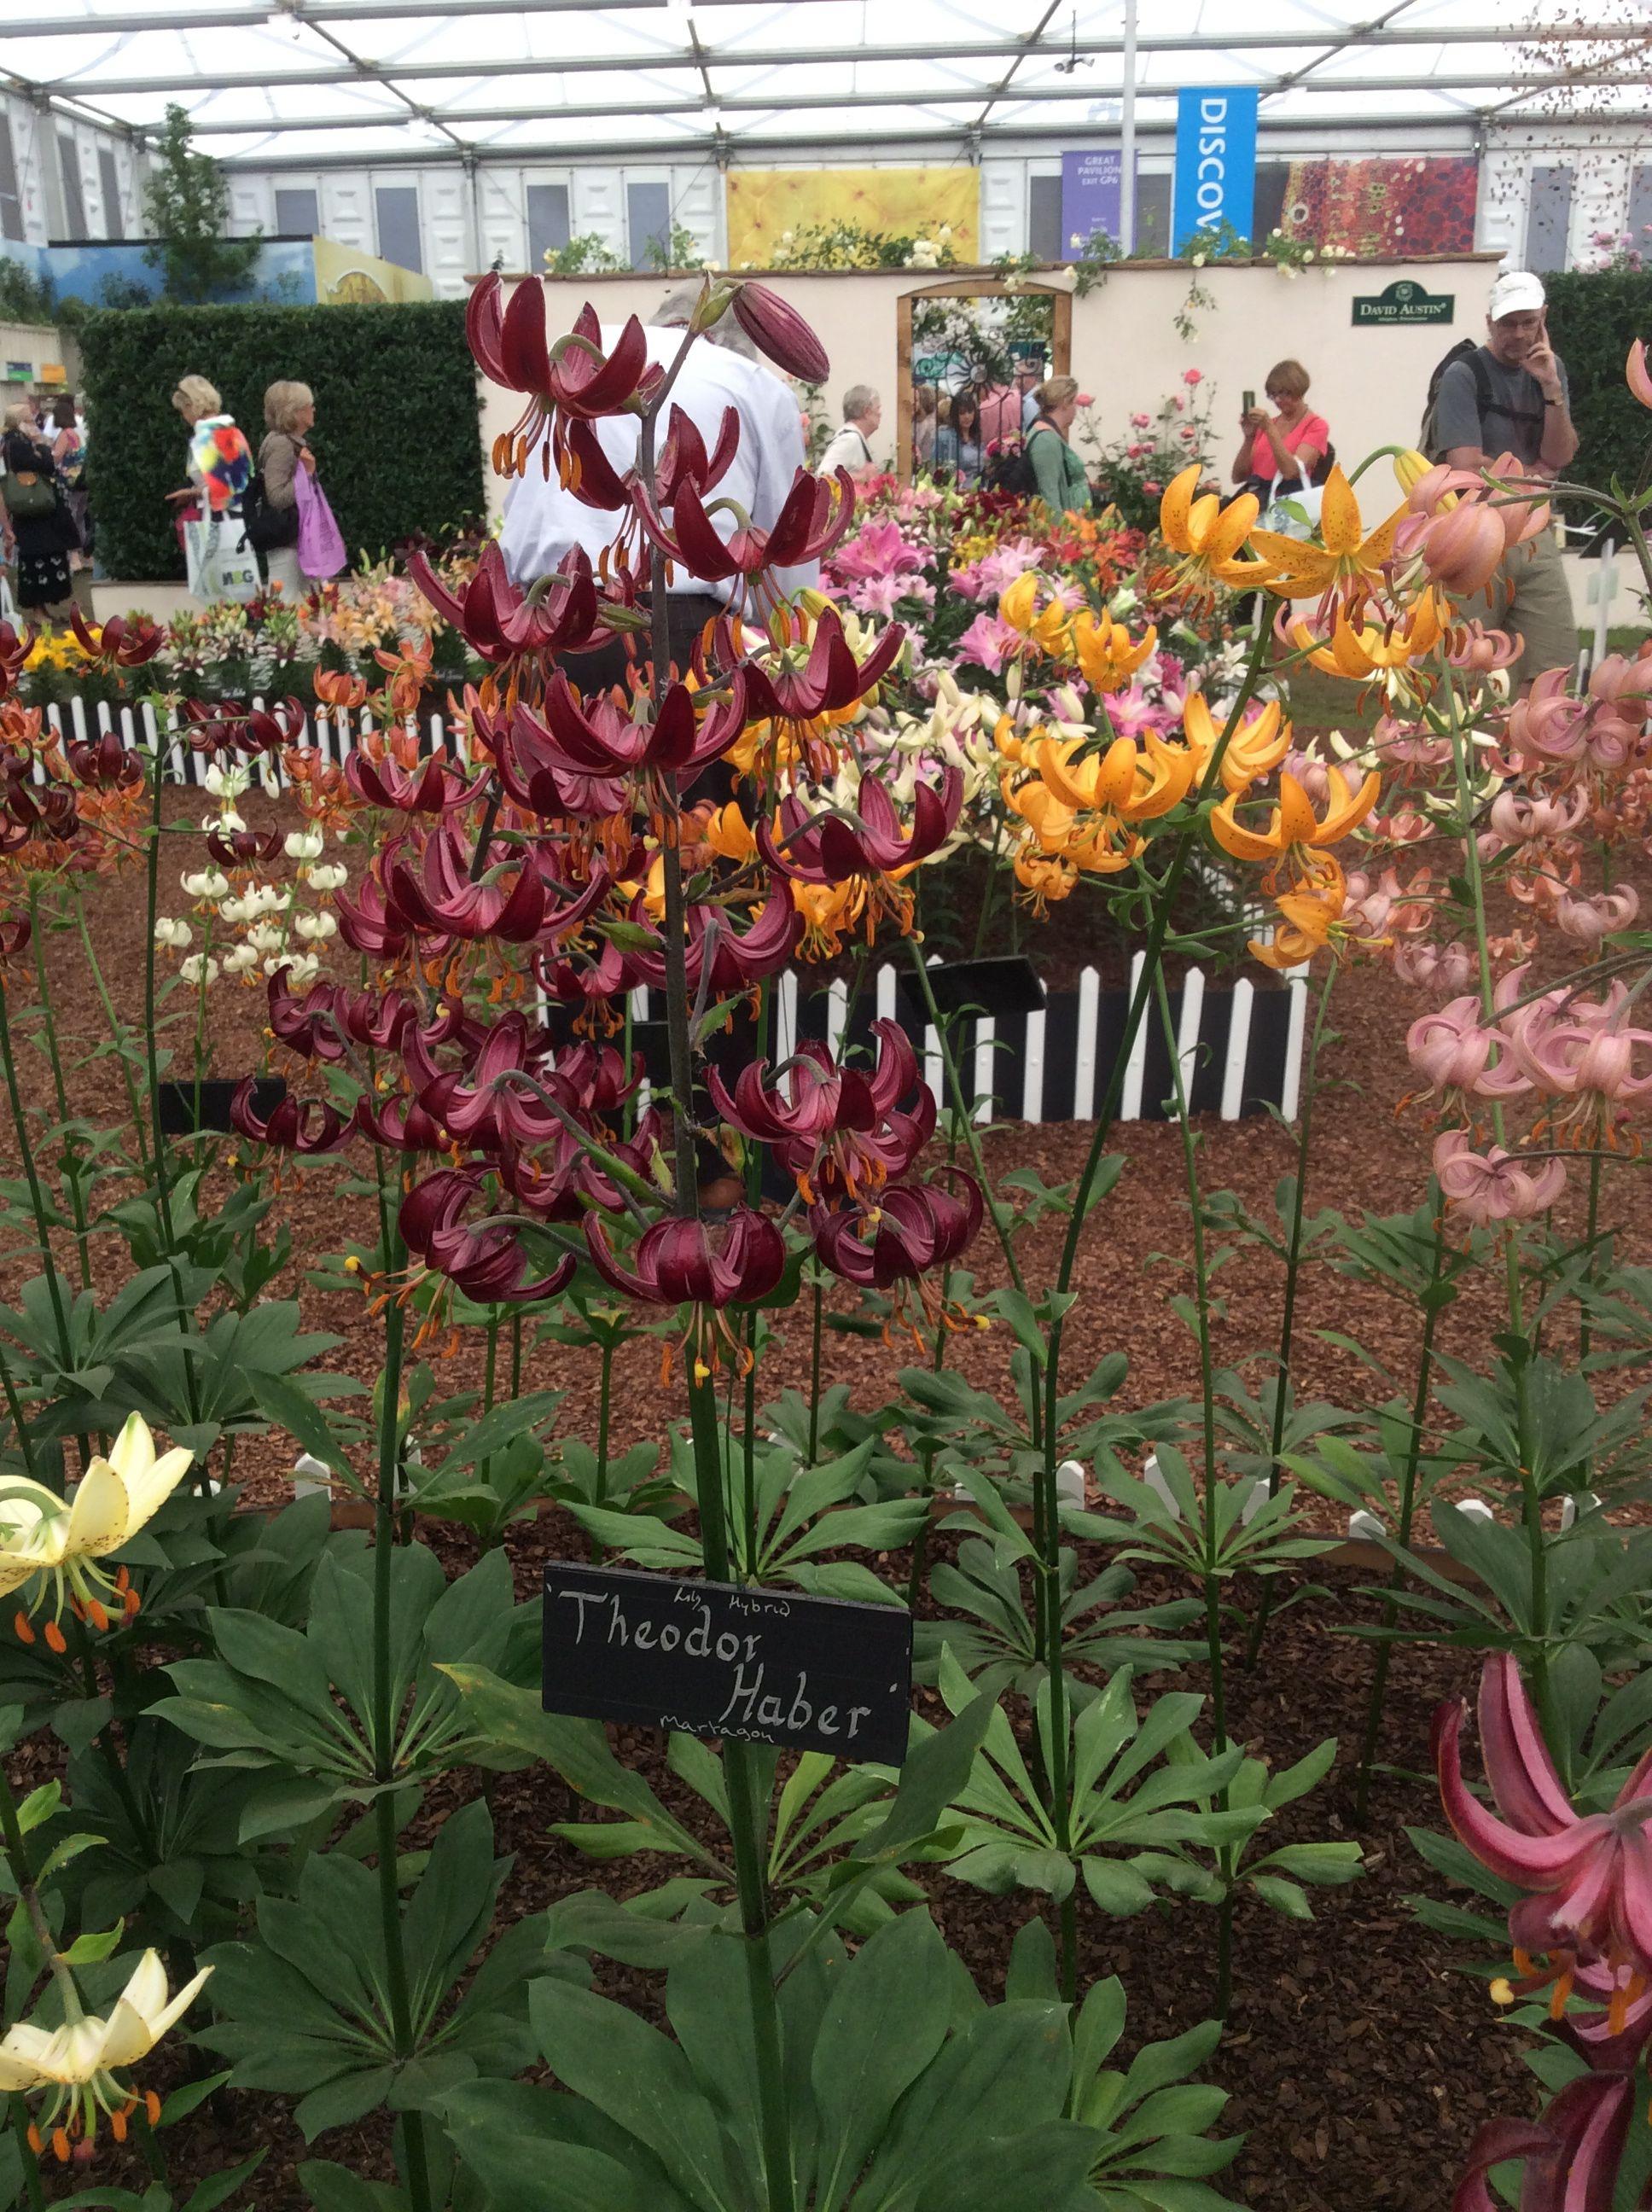 lilium martagon Theodore Haber at Chelsea #lily   Gardens & Plants ...